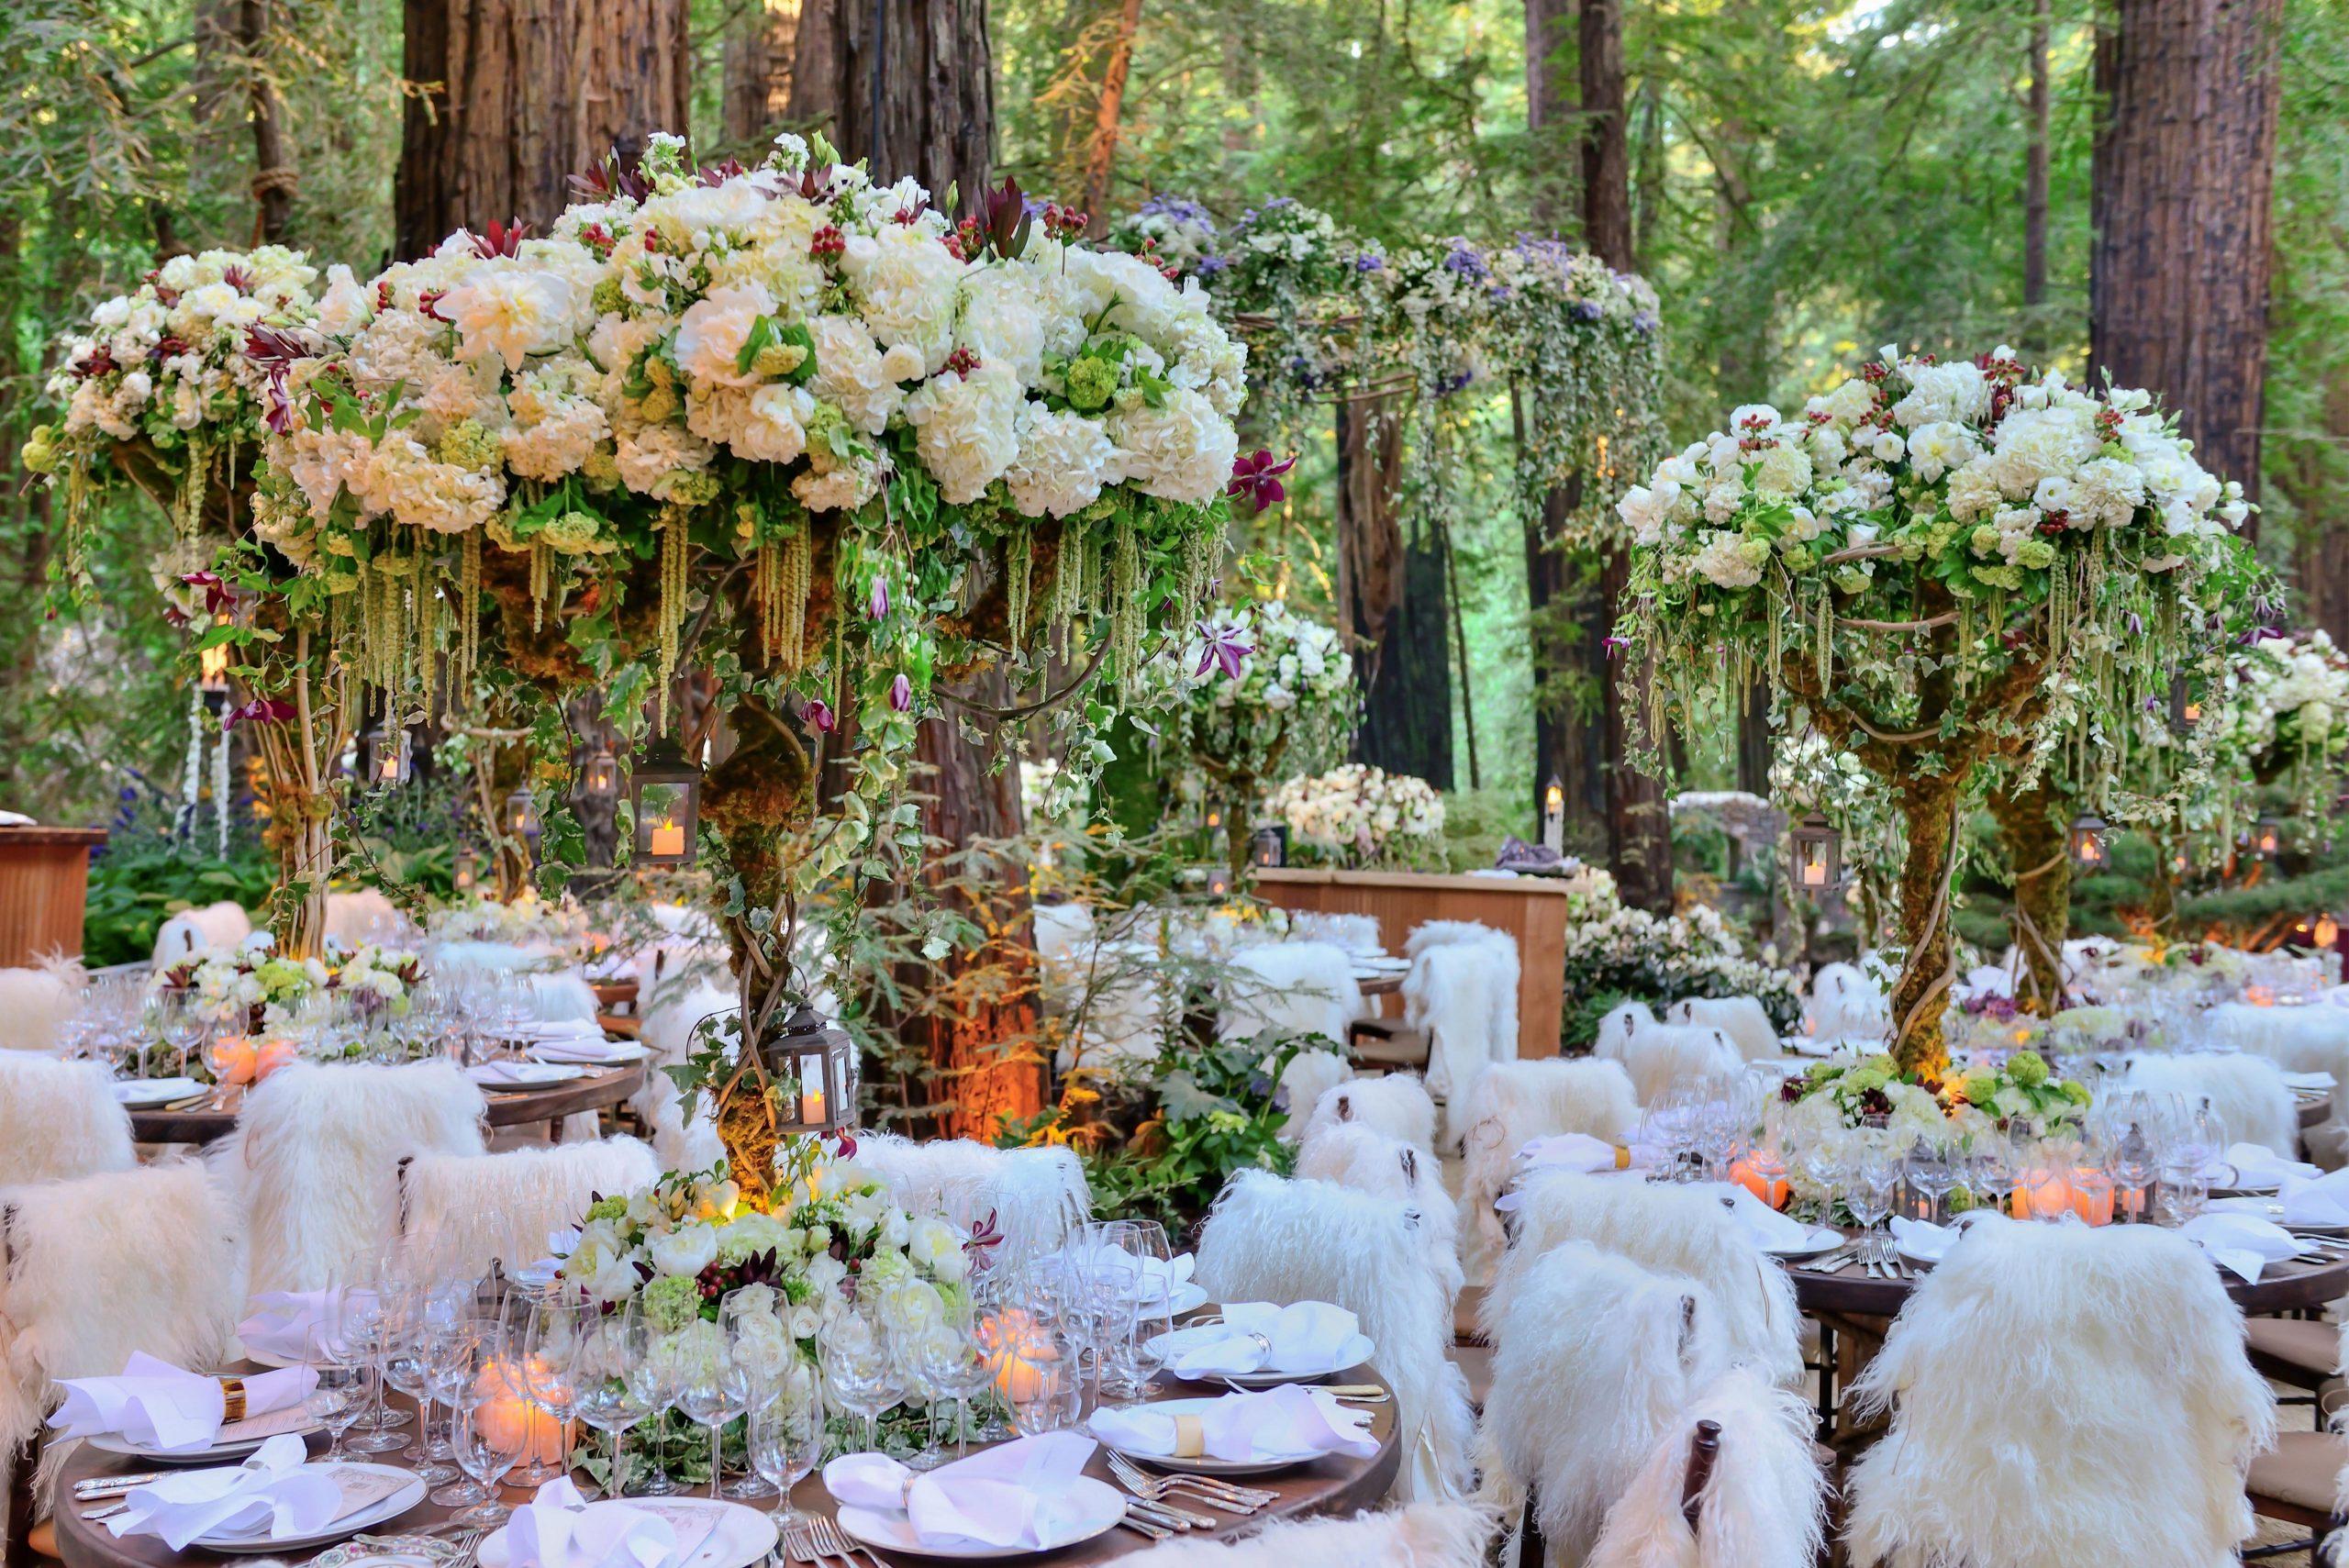 Peston Bailey Wedding Planner - Wedding Hub - 03